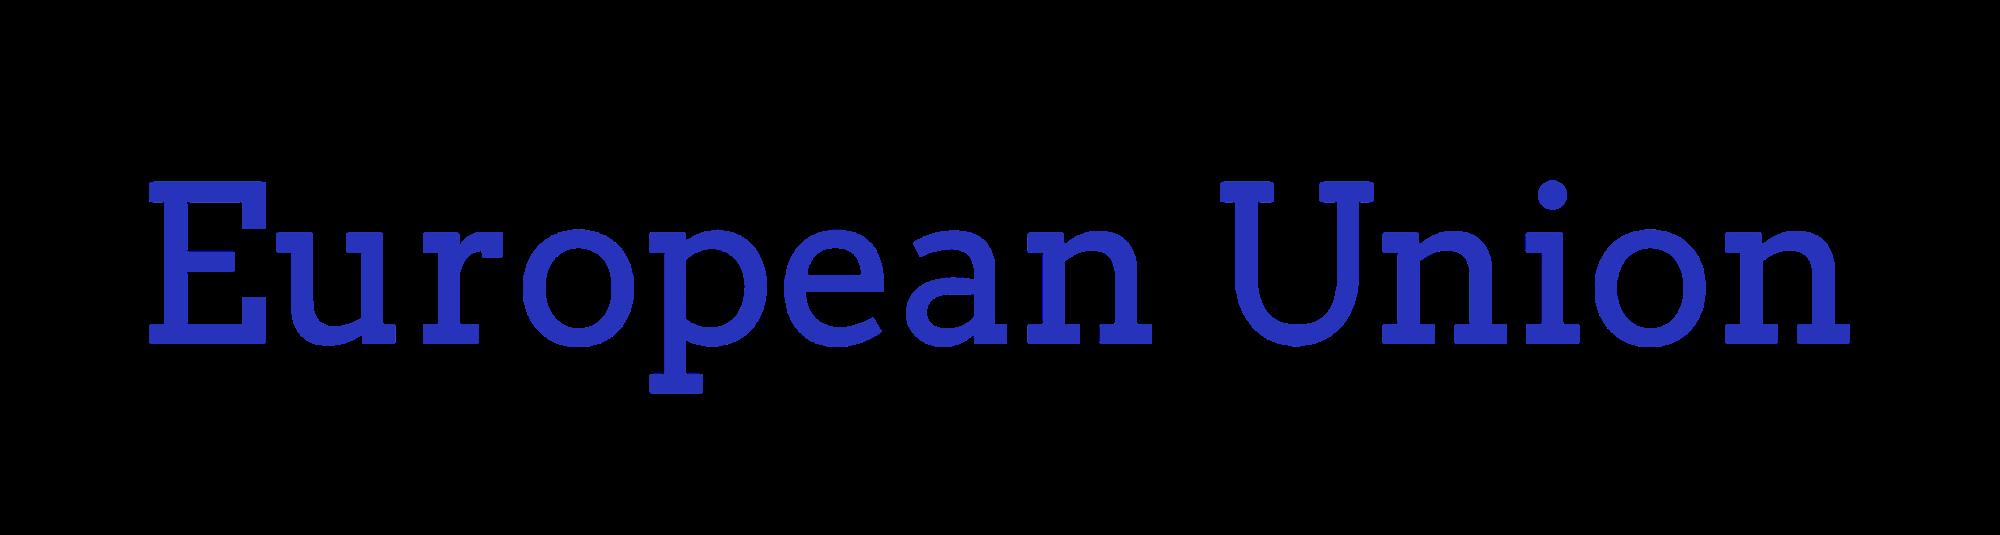 European Union-logo.png